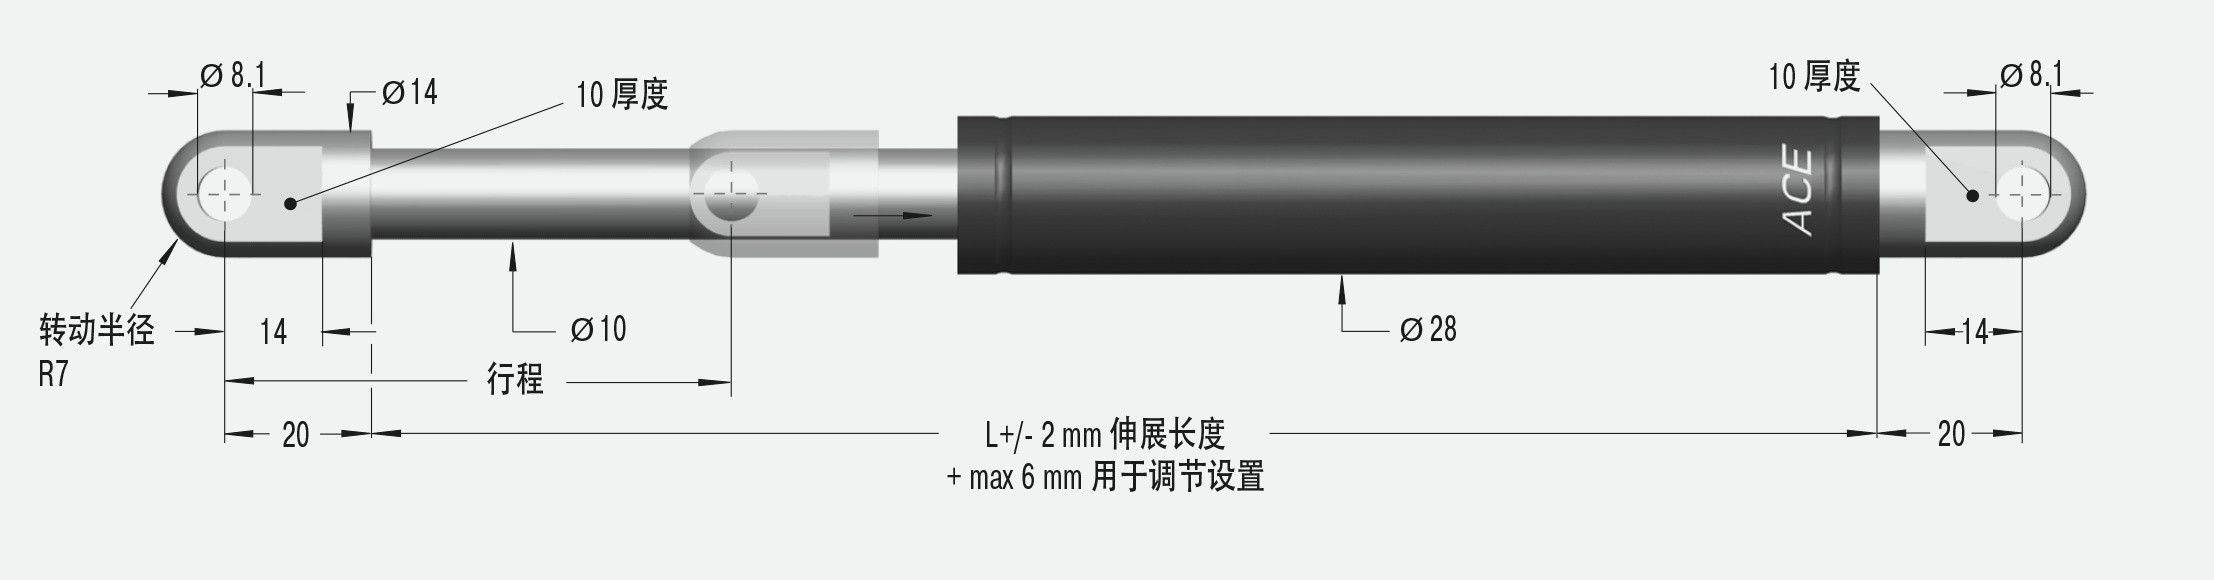 HB-28-400